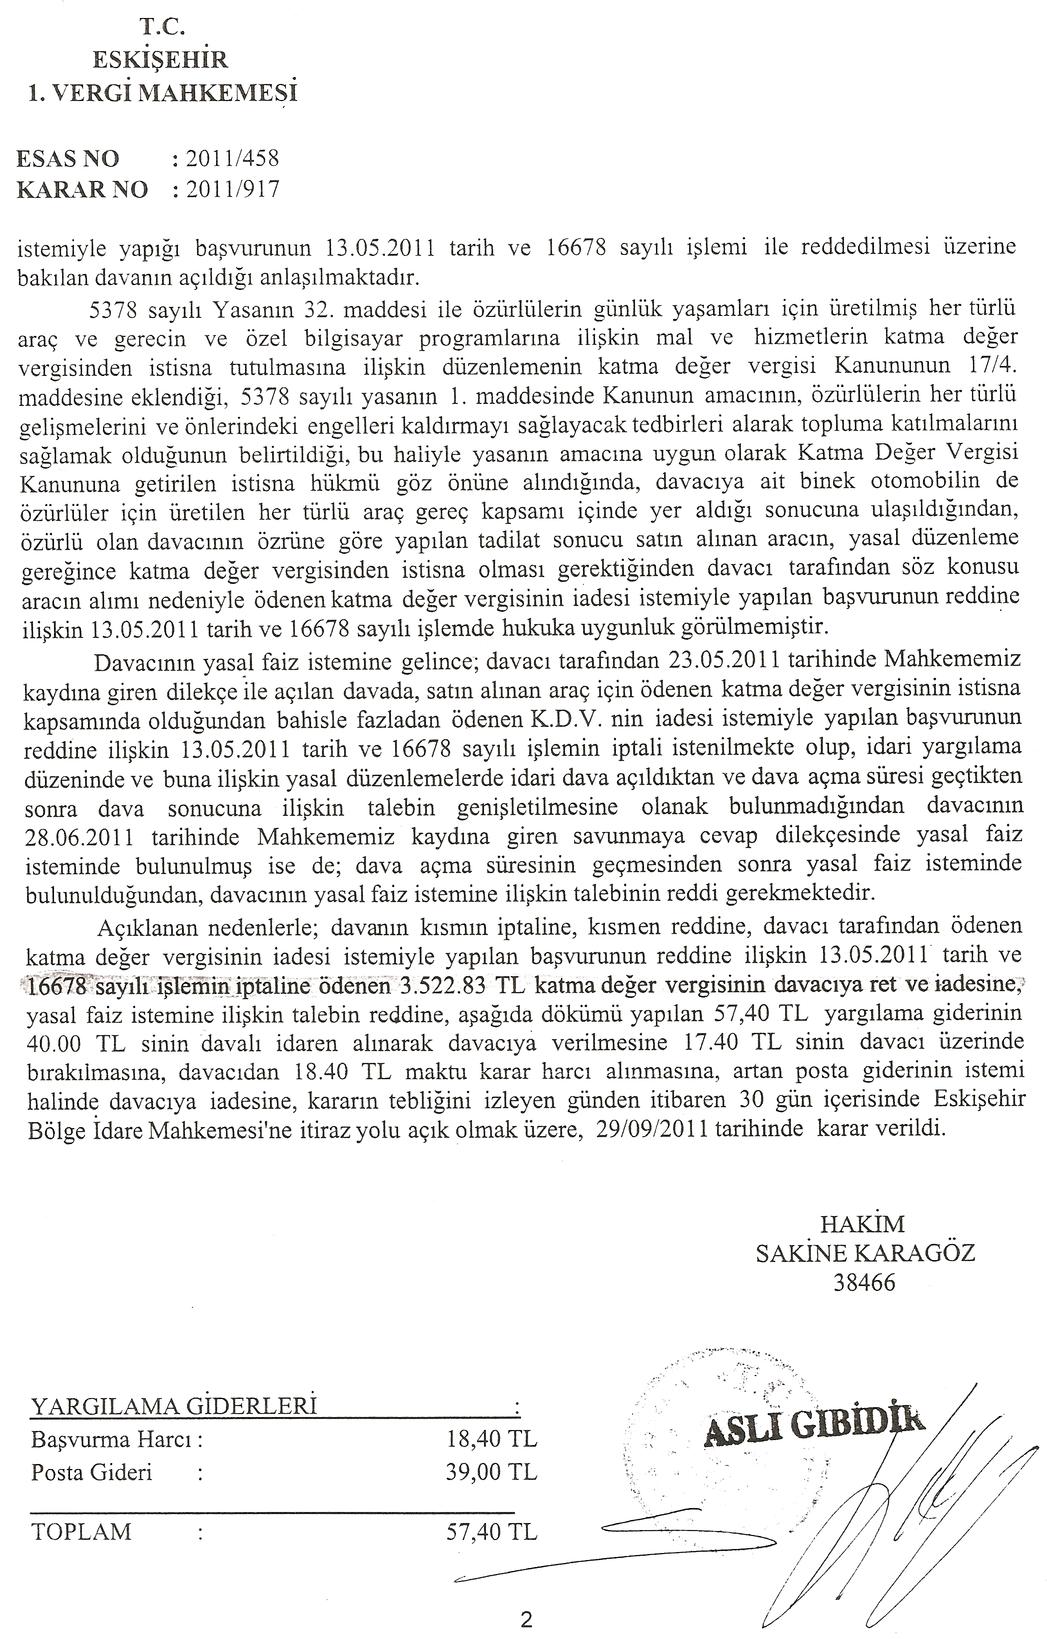 eskisehir vergi mahkemesi 2 - Sakat stat�s�nde al�nan ara� i�in �denen KDV'nin geri al�nmas� i�lemleri ve s�re�